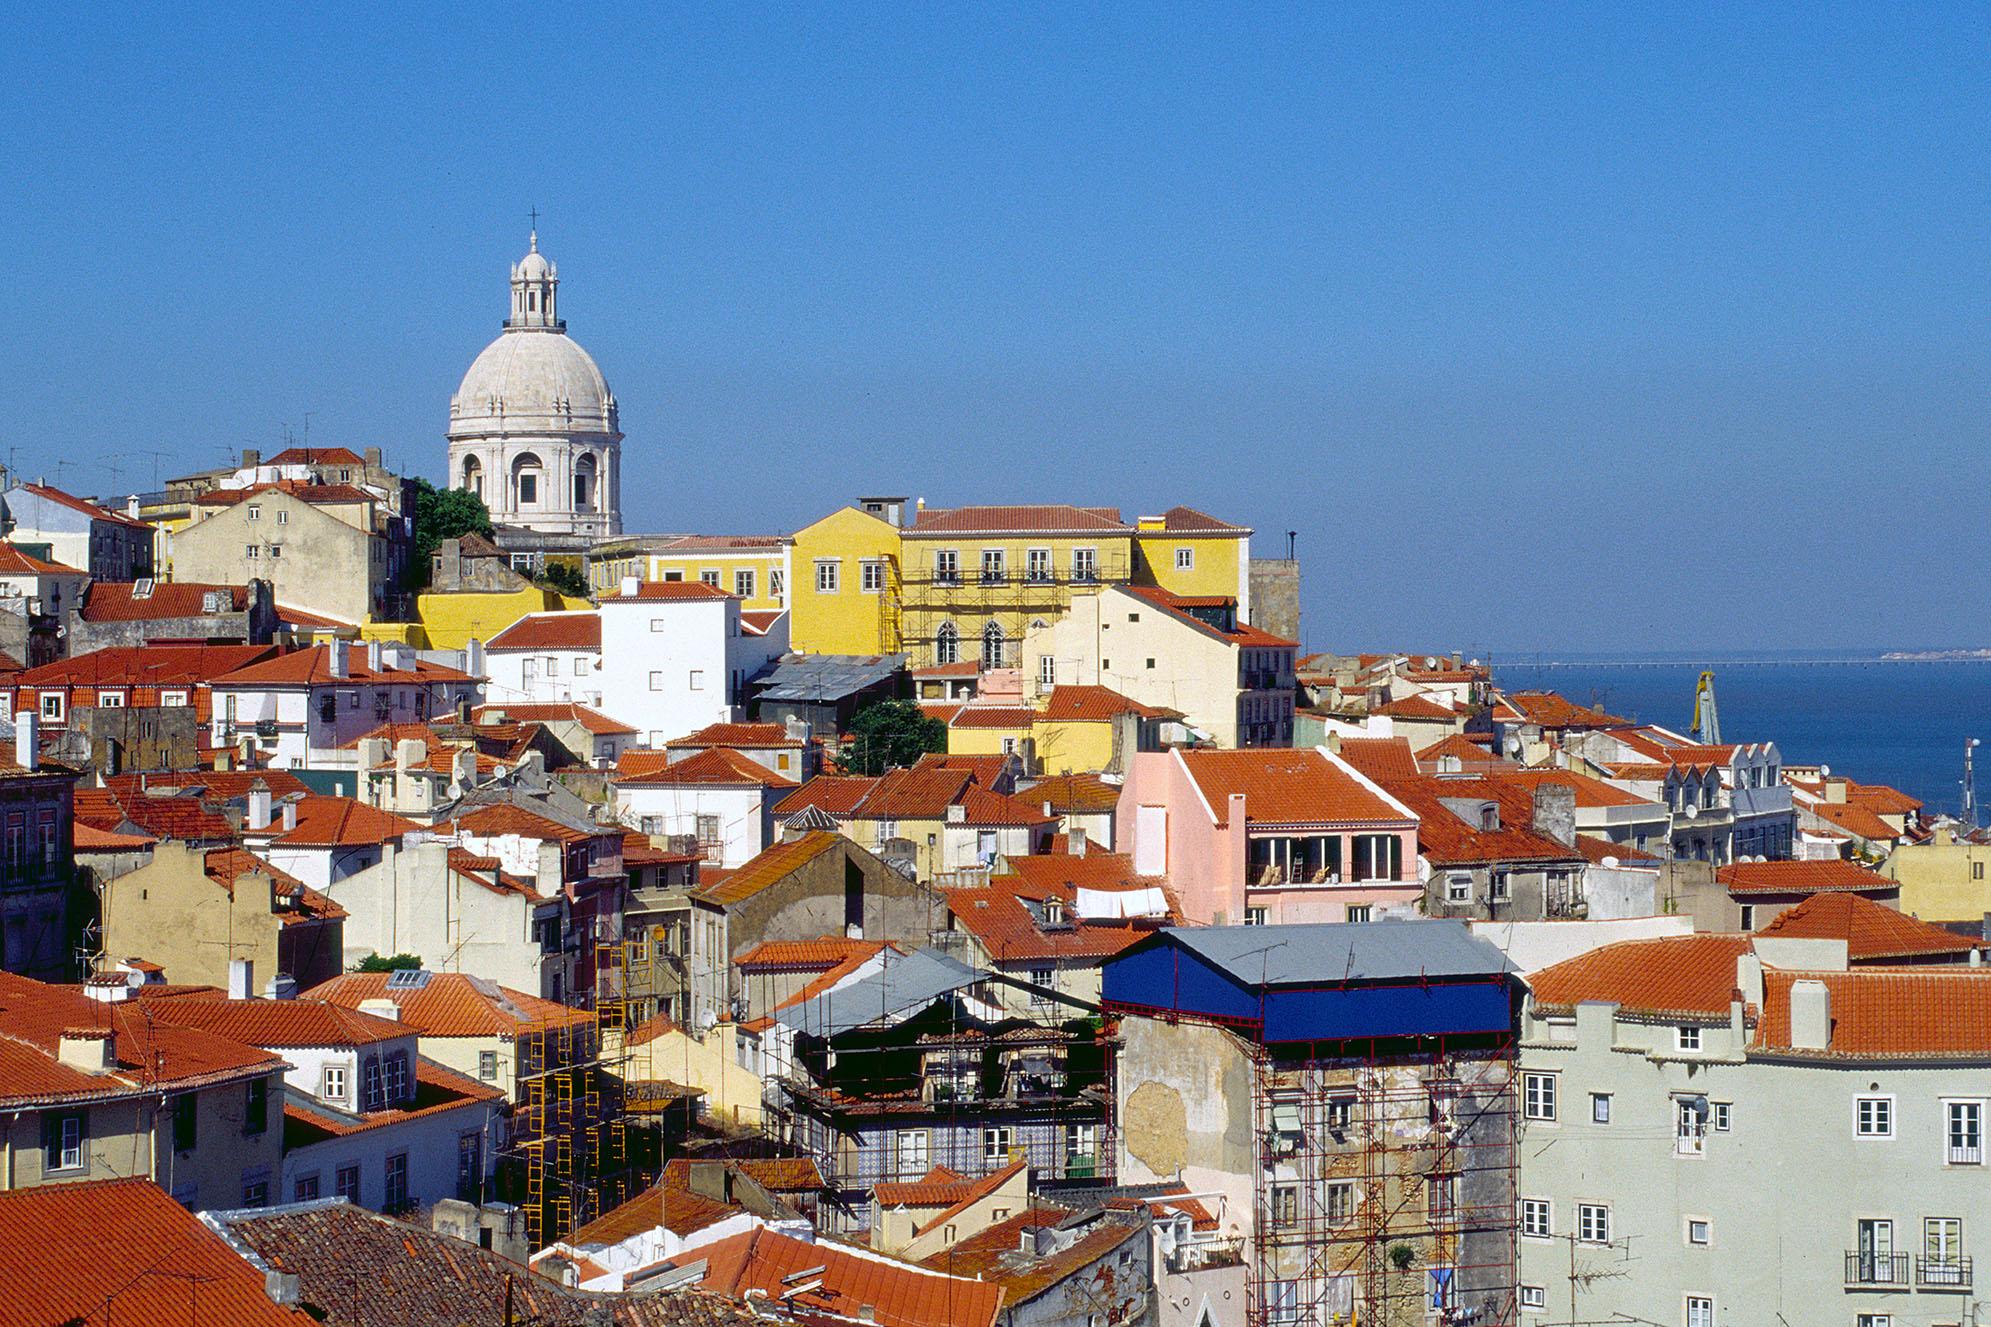 Miradouro de Santa Luzia i Lissabon